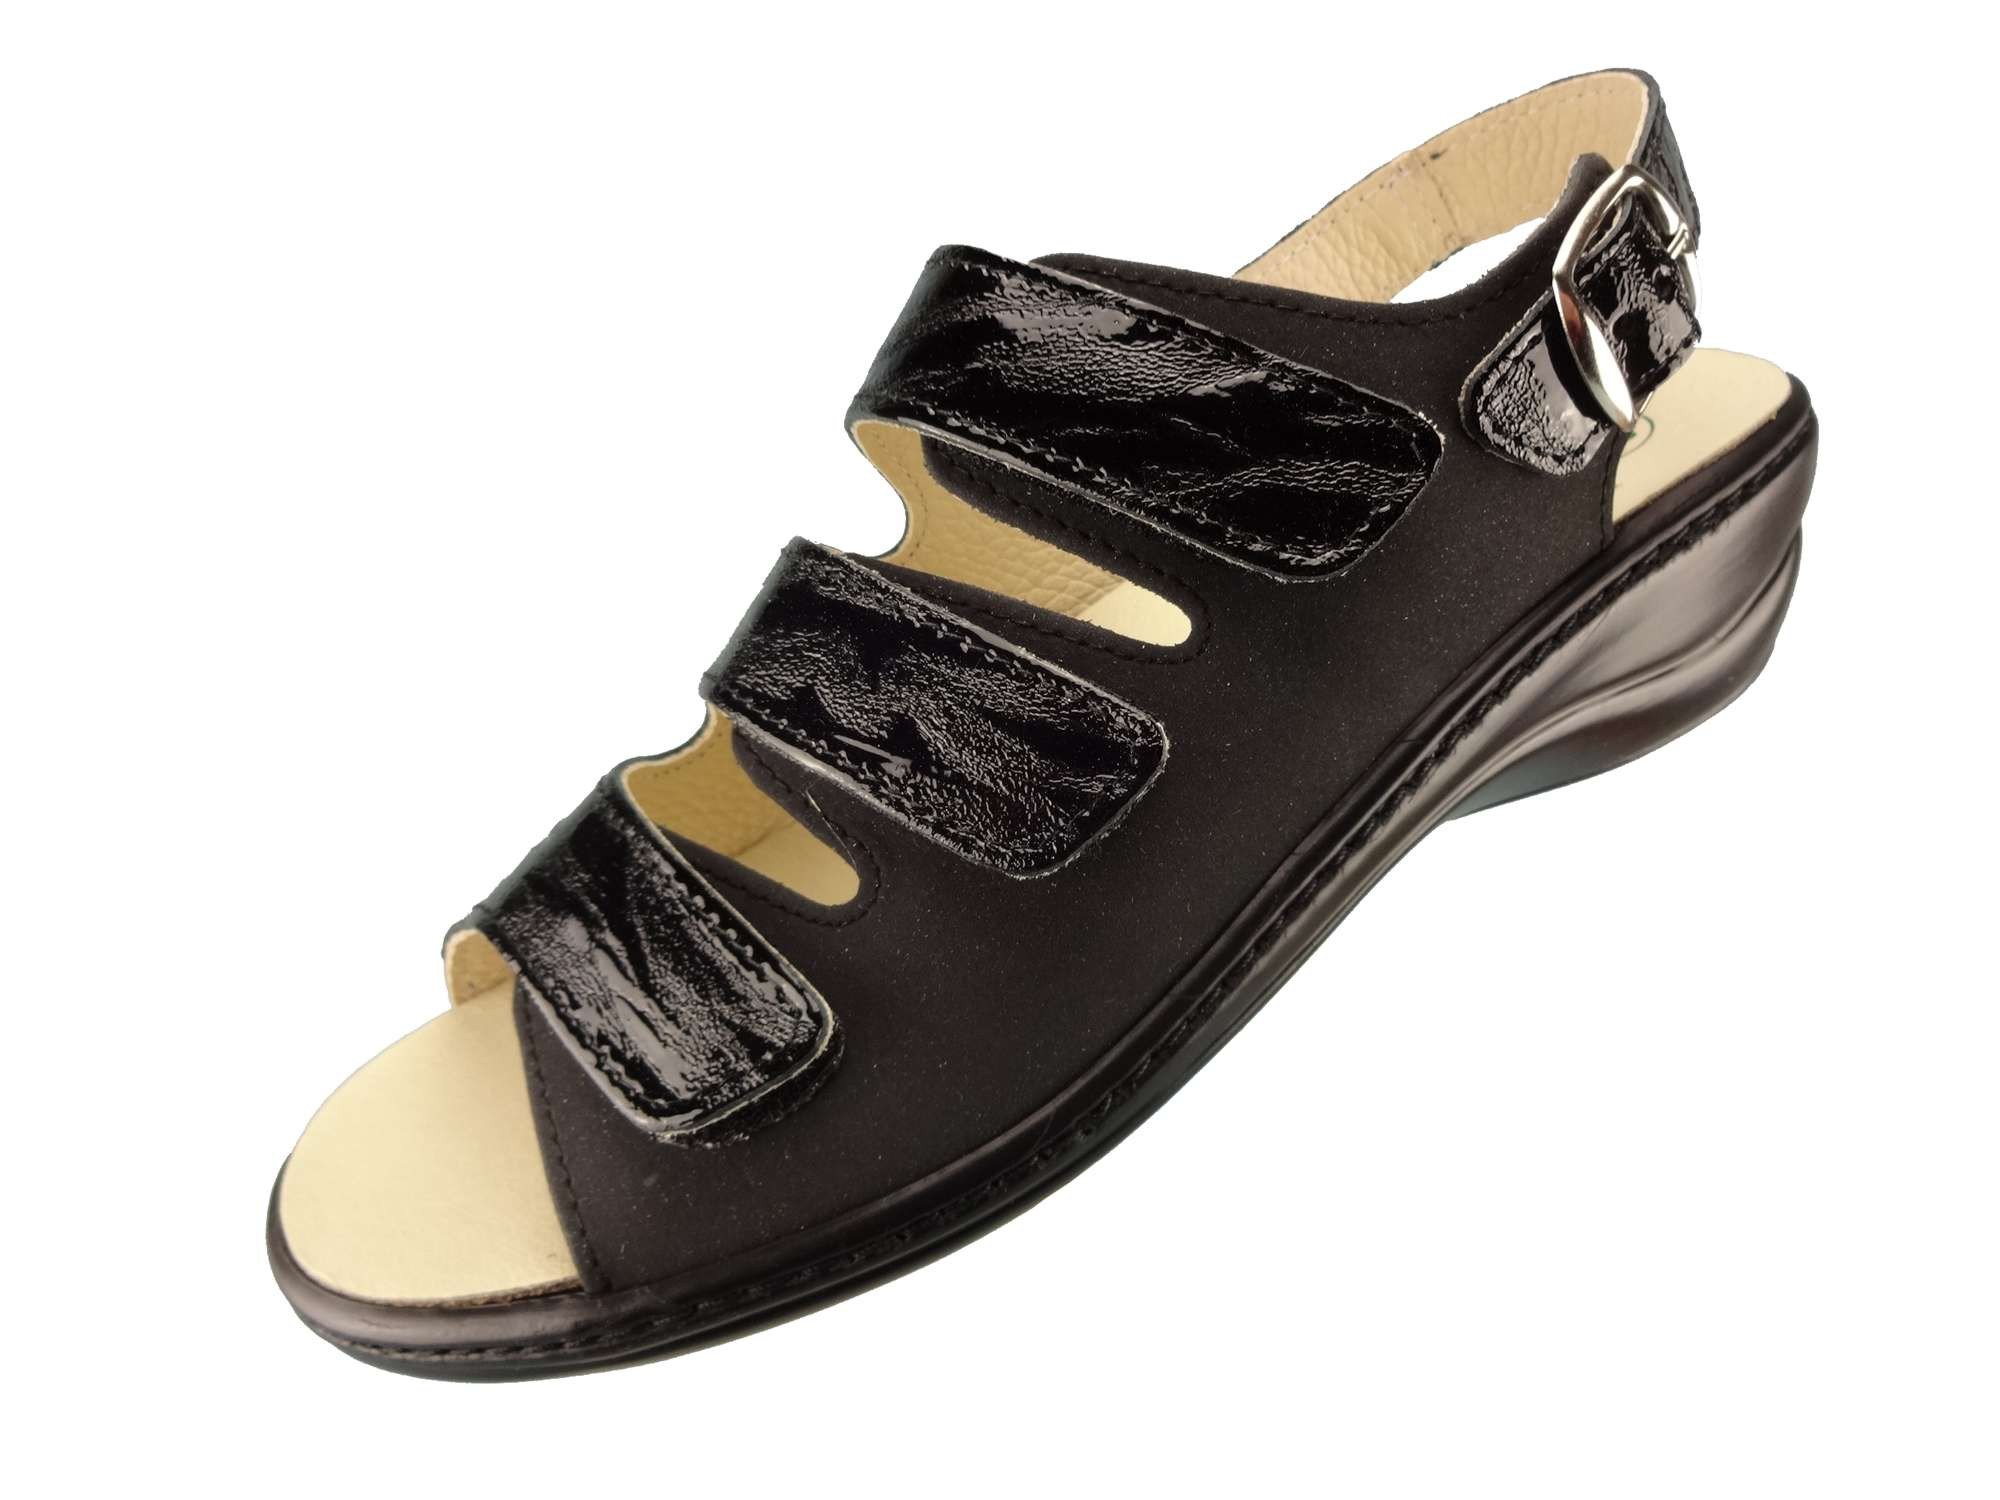 Algemare Damen Sandalette Nubuk Rigato Keilpantolette mit Algen-Kork Wechselfußbett Made in Germany 2317_0307 Sandale Fußbettsandale